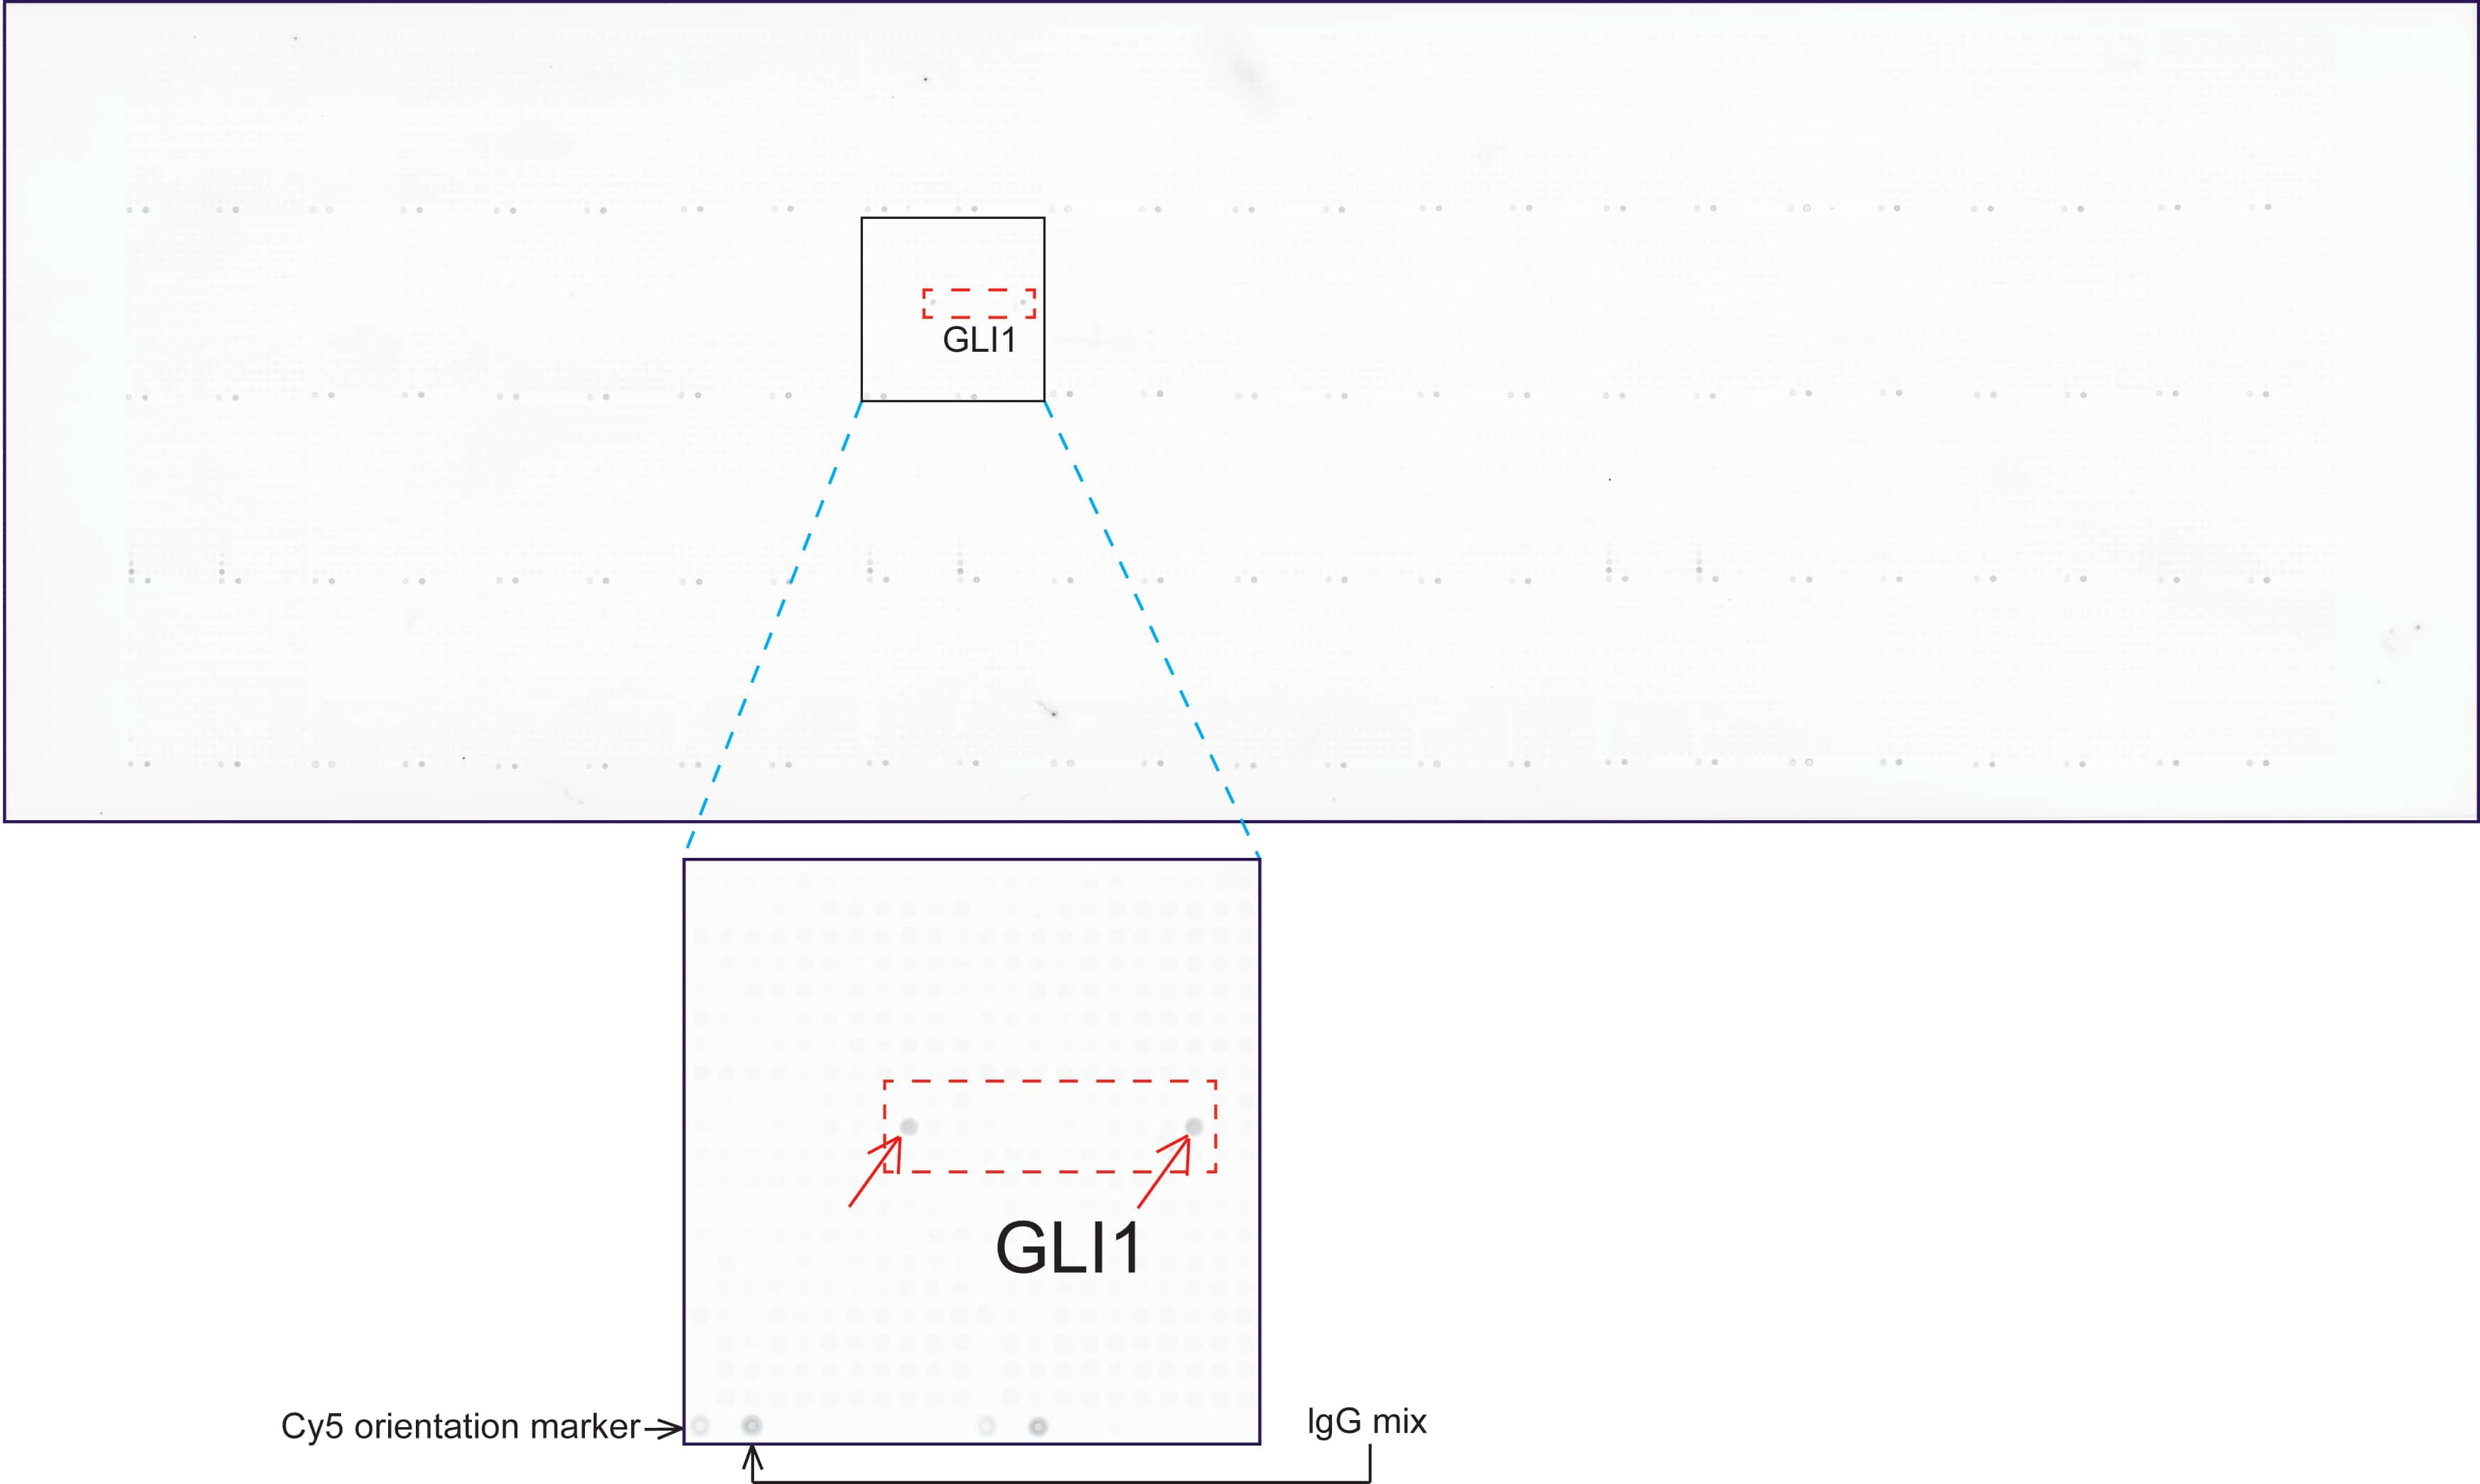 GLI1 Antibody in Peptide array (ARRAY)